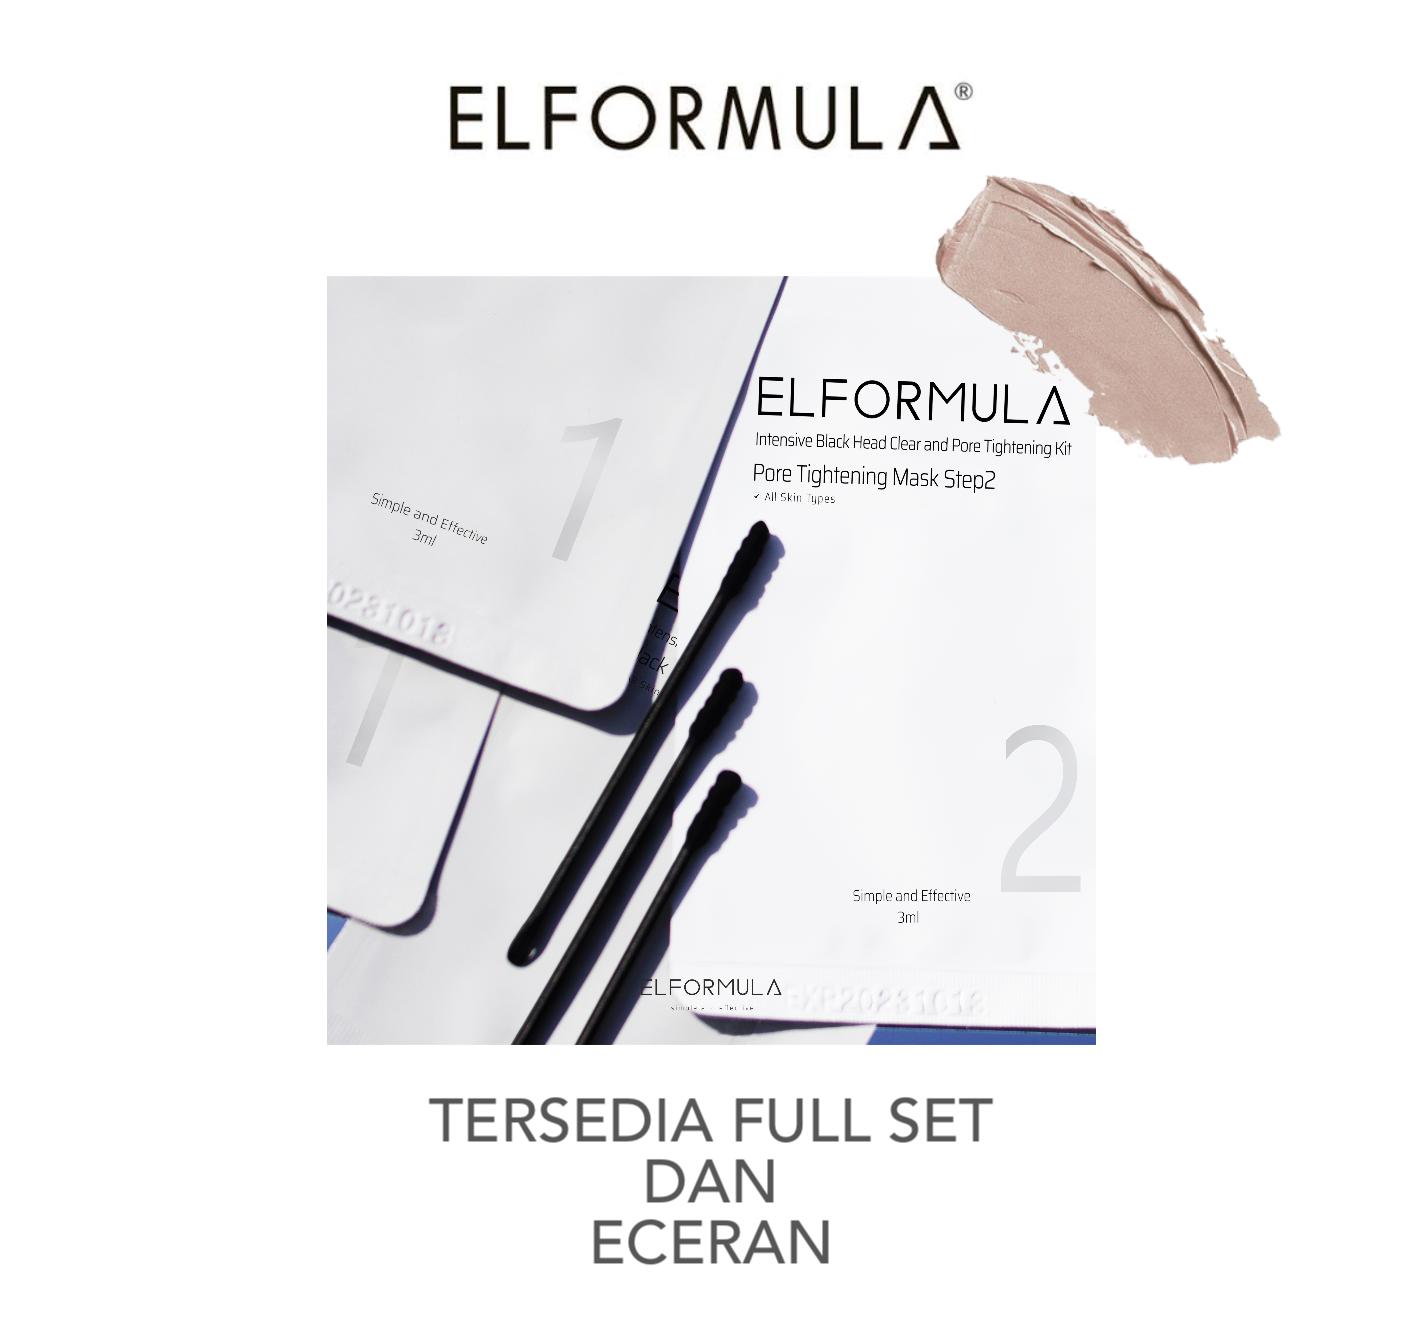 Elformula Intensive Blackhead Clear and Pore Tightening Kit - 1 set thumbnail